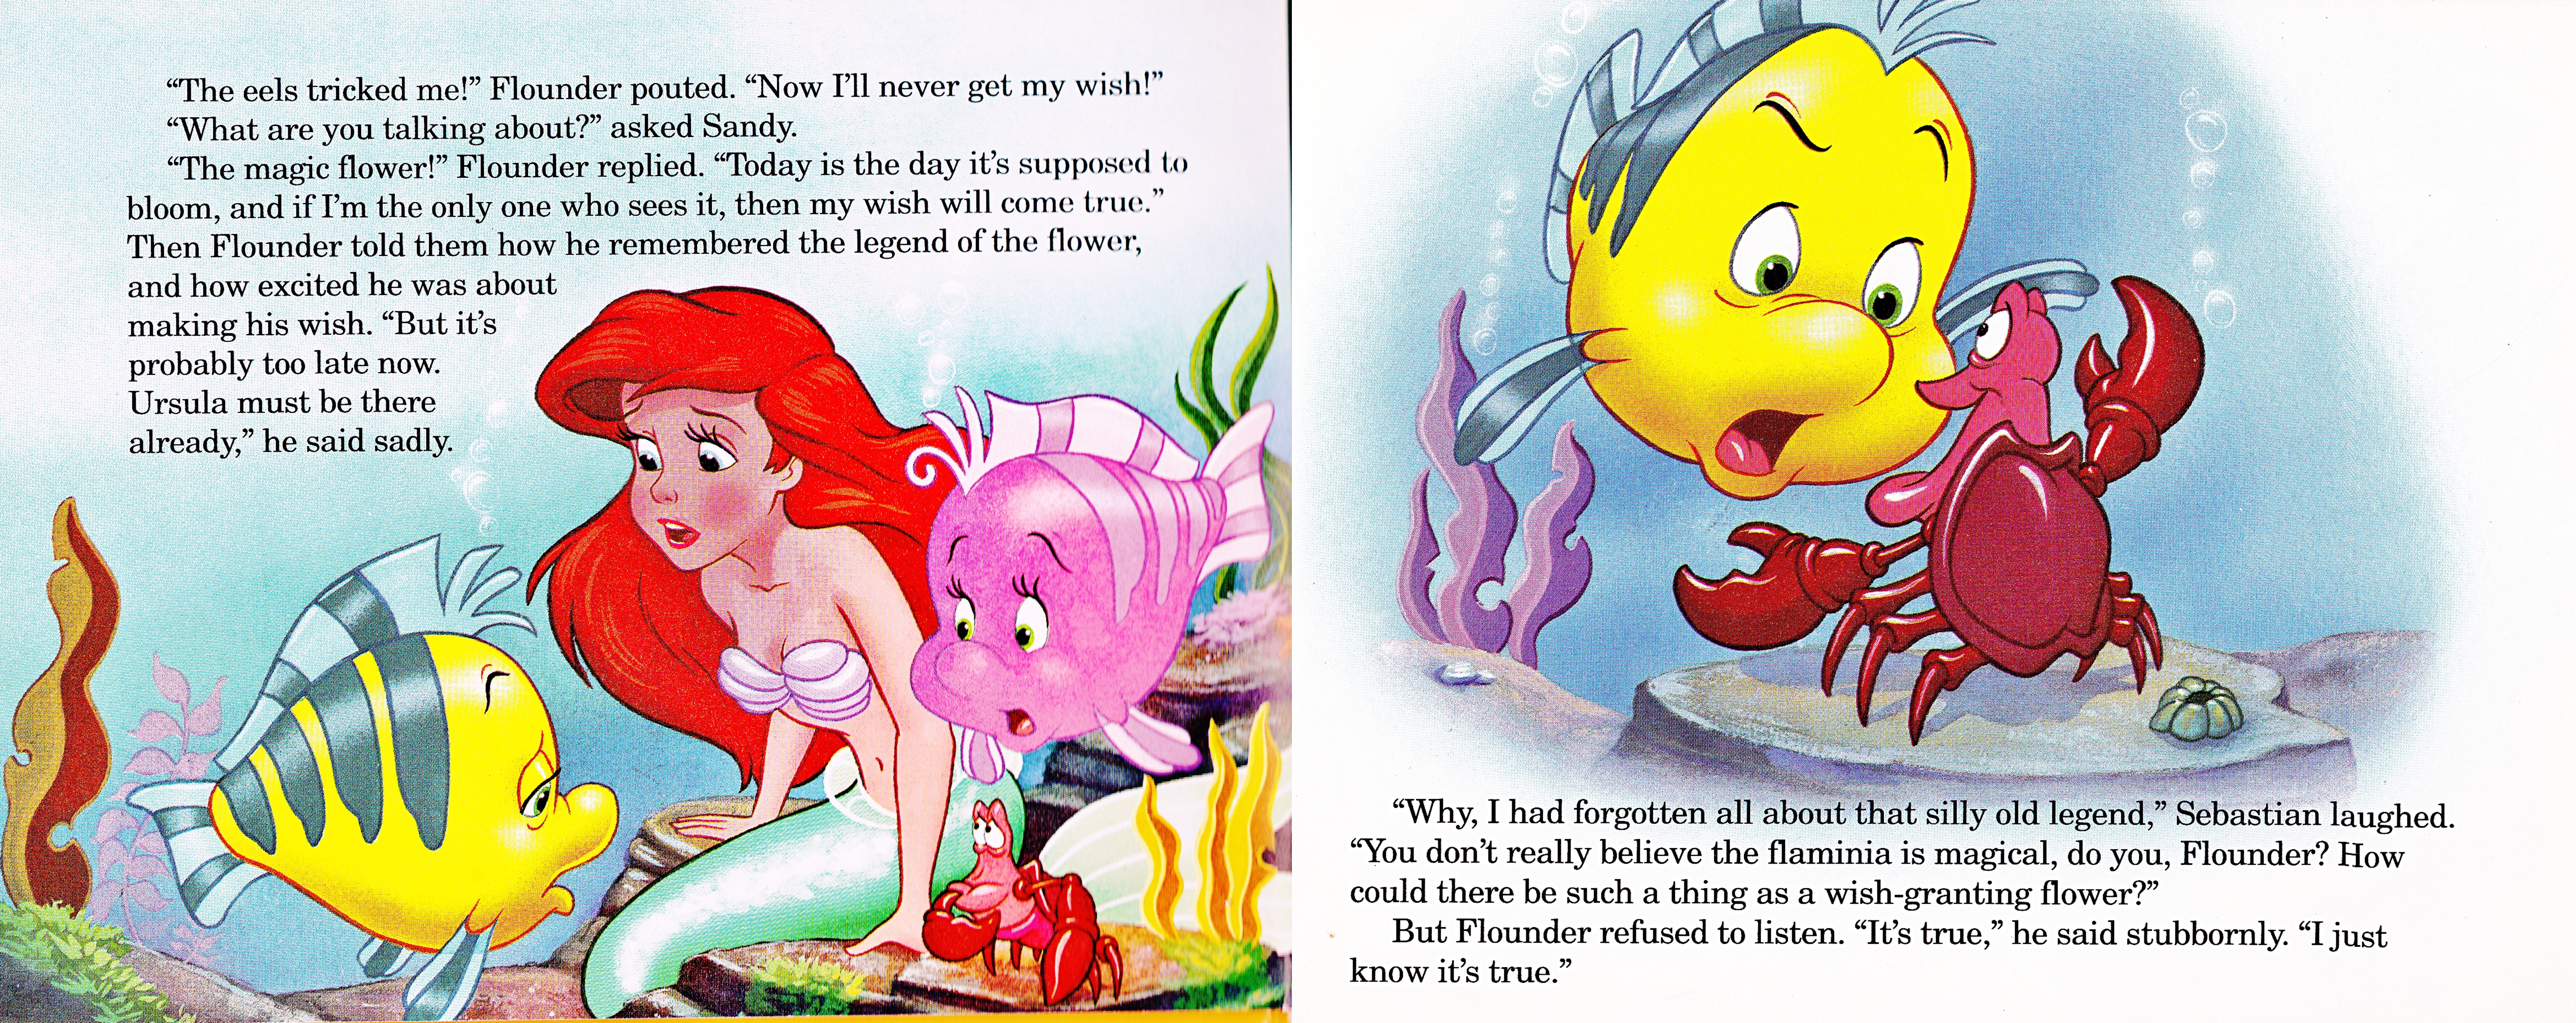 Walt Disney Book images - The Little Mermaid's Treasure Chest: An Undersea Wish